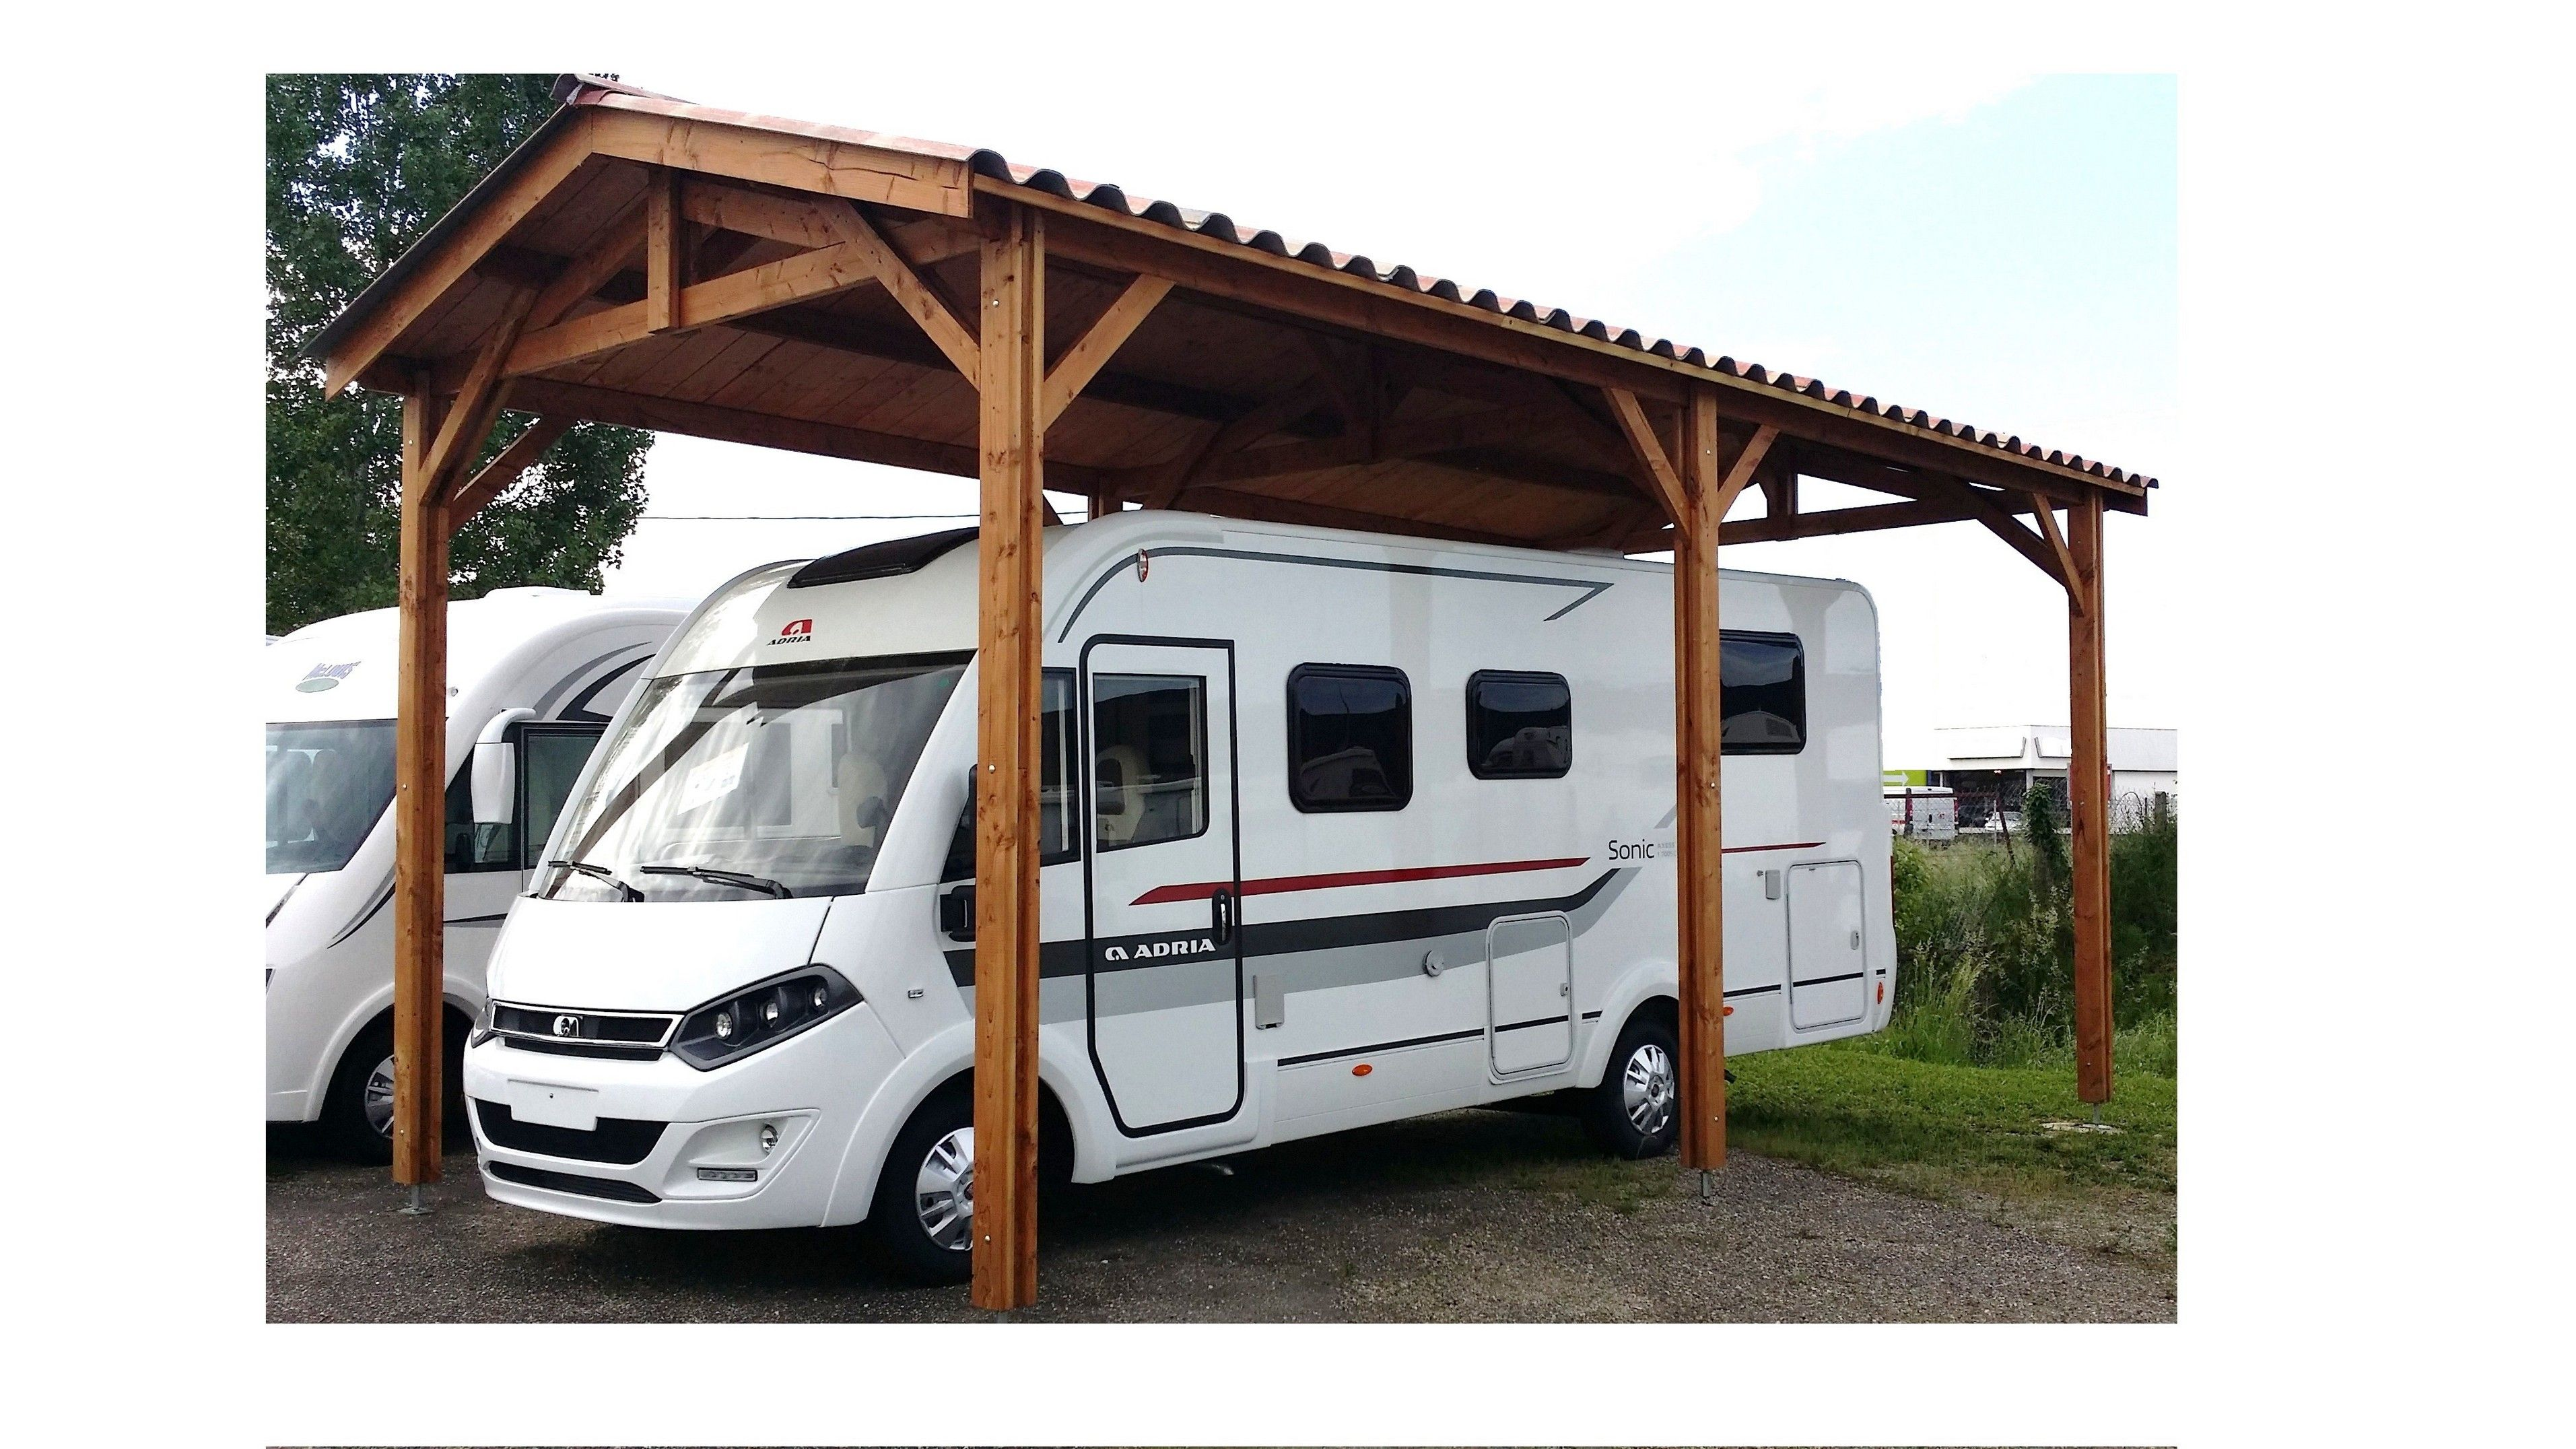 Vente d'abris camping car bois 49,44,85,53,79 Rv storage